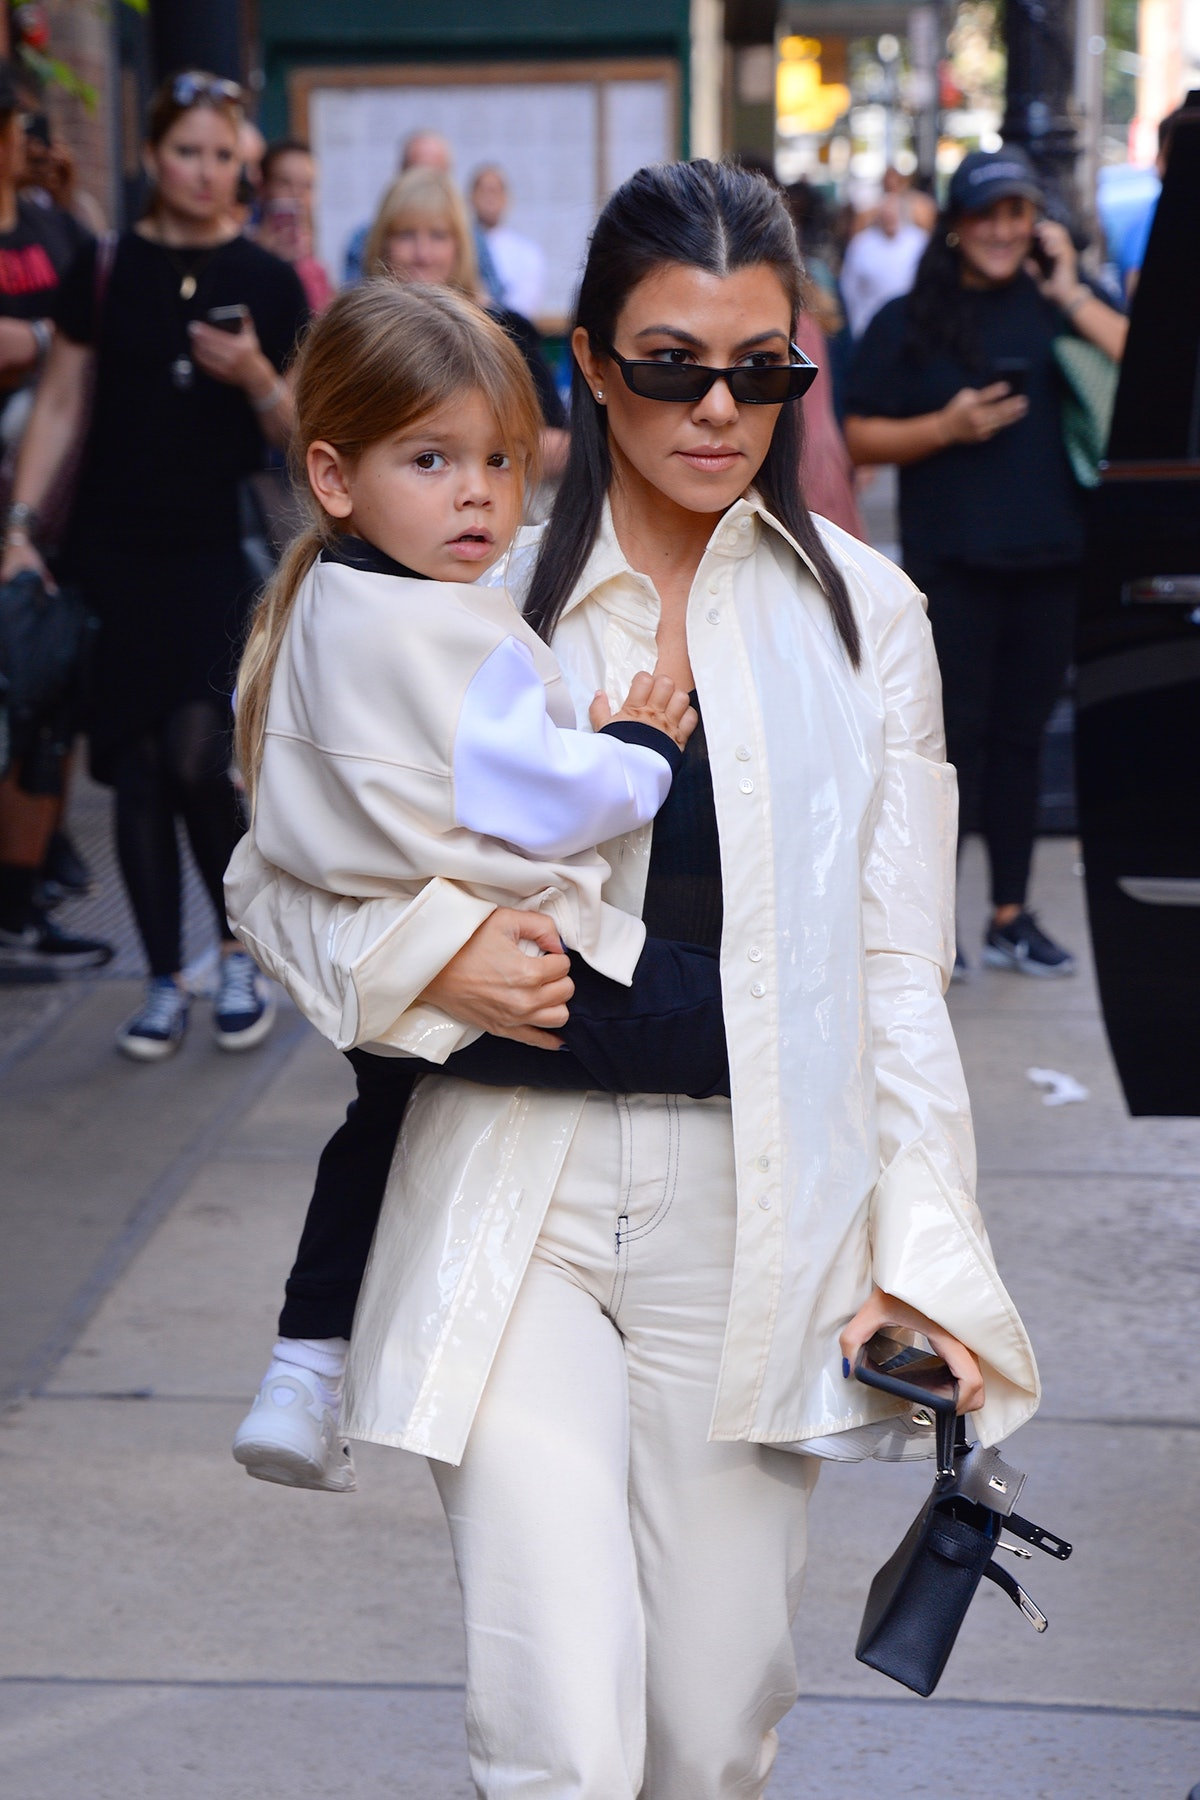 Kourtney Kardashian steps out with son Reign.